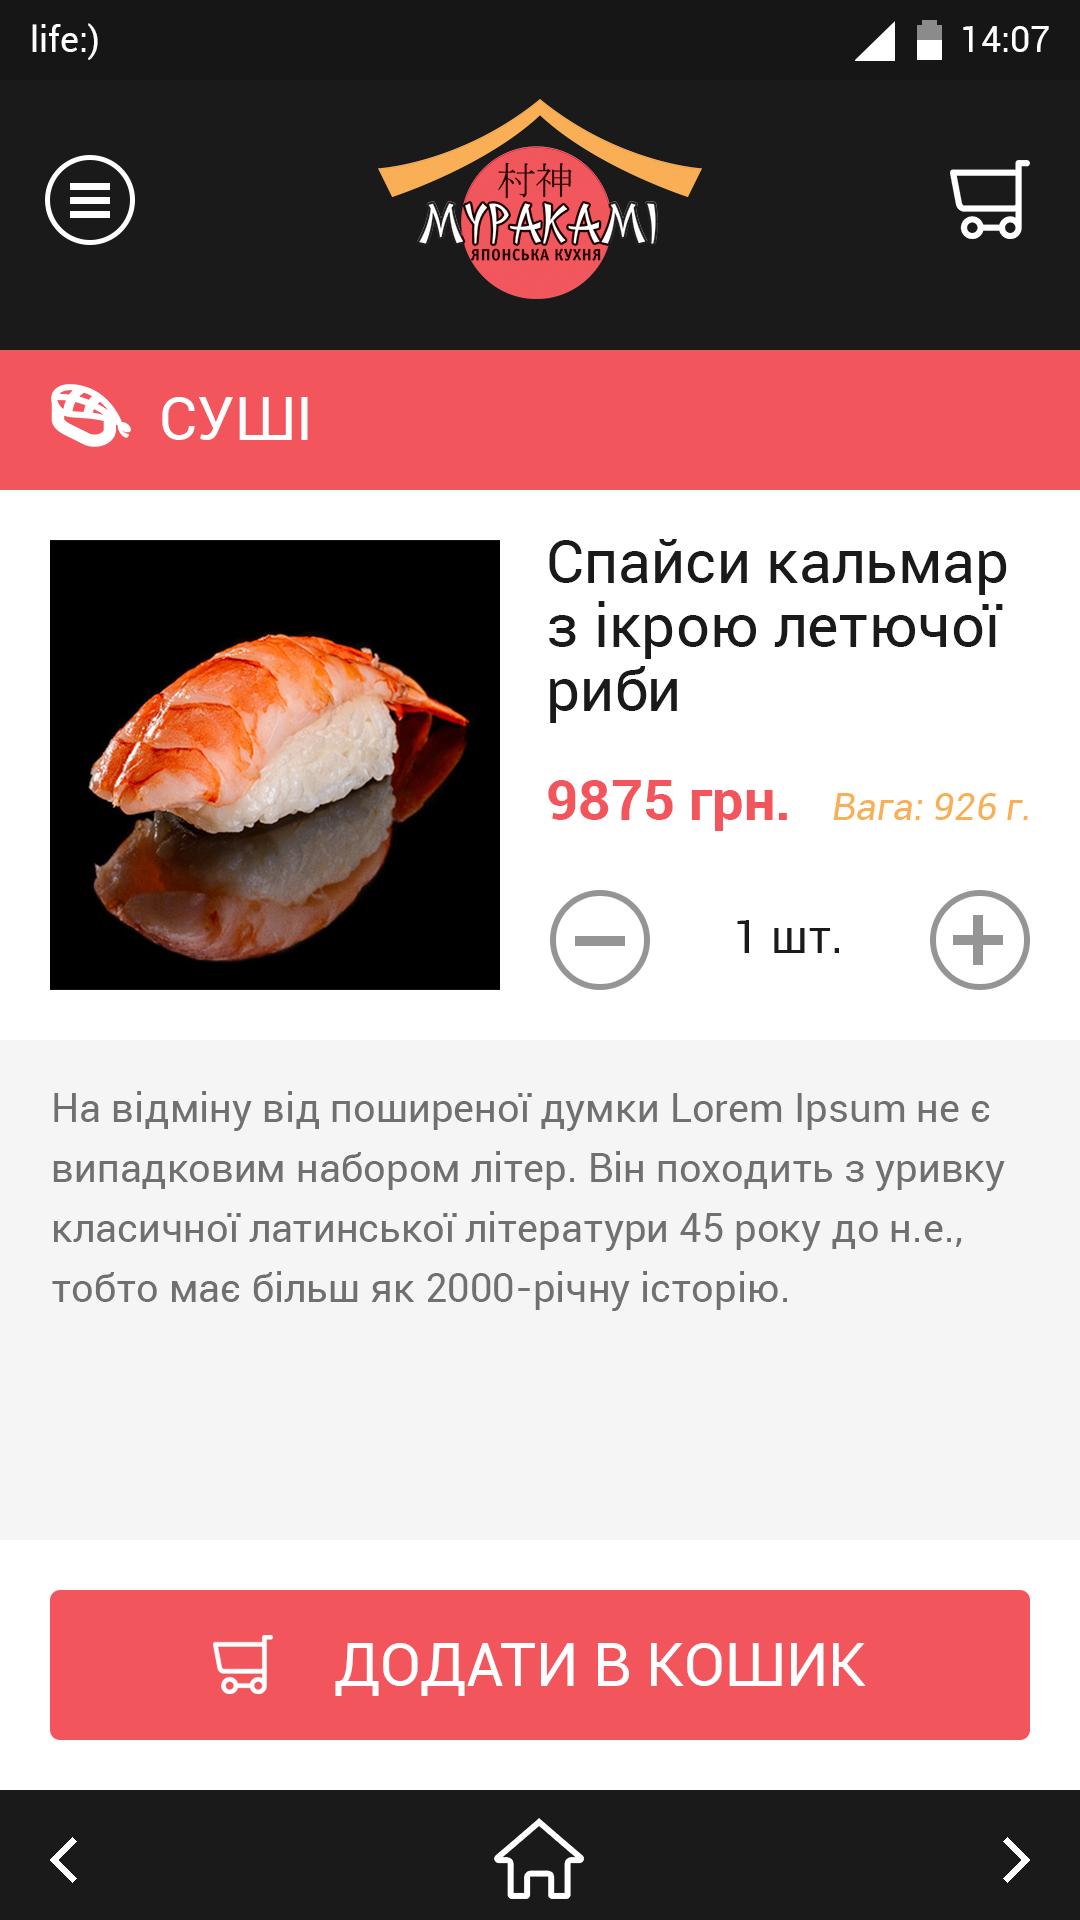 app_murakami_v3_single_product